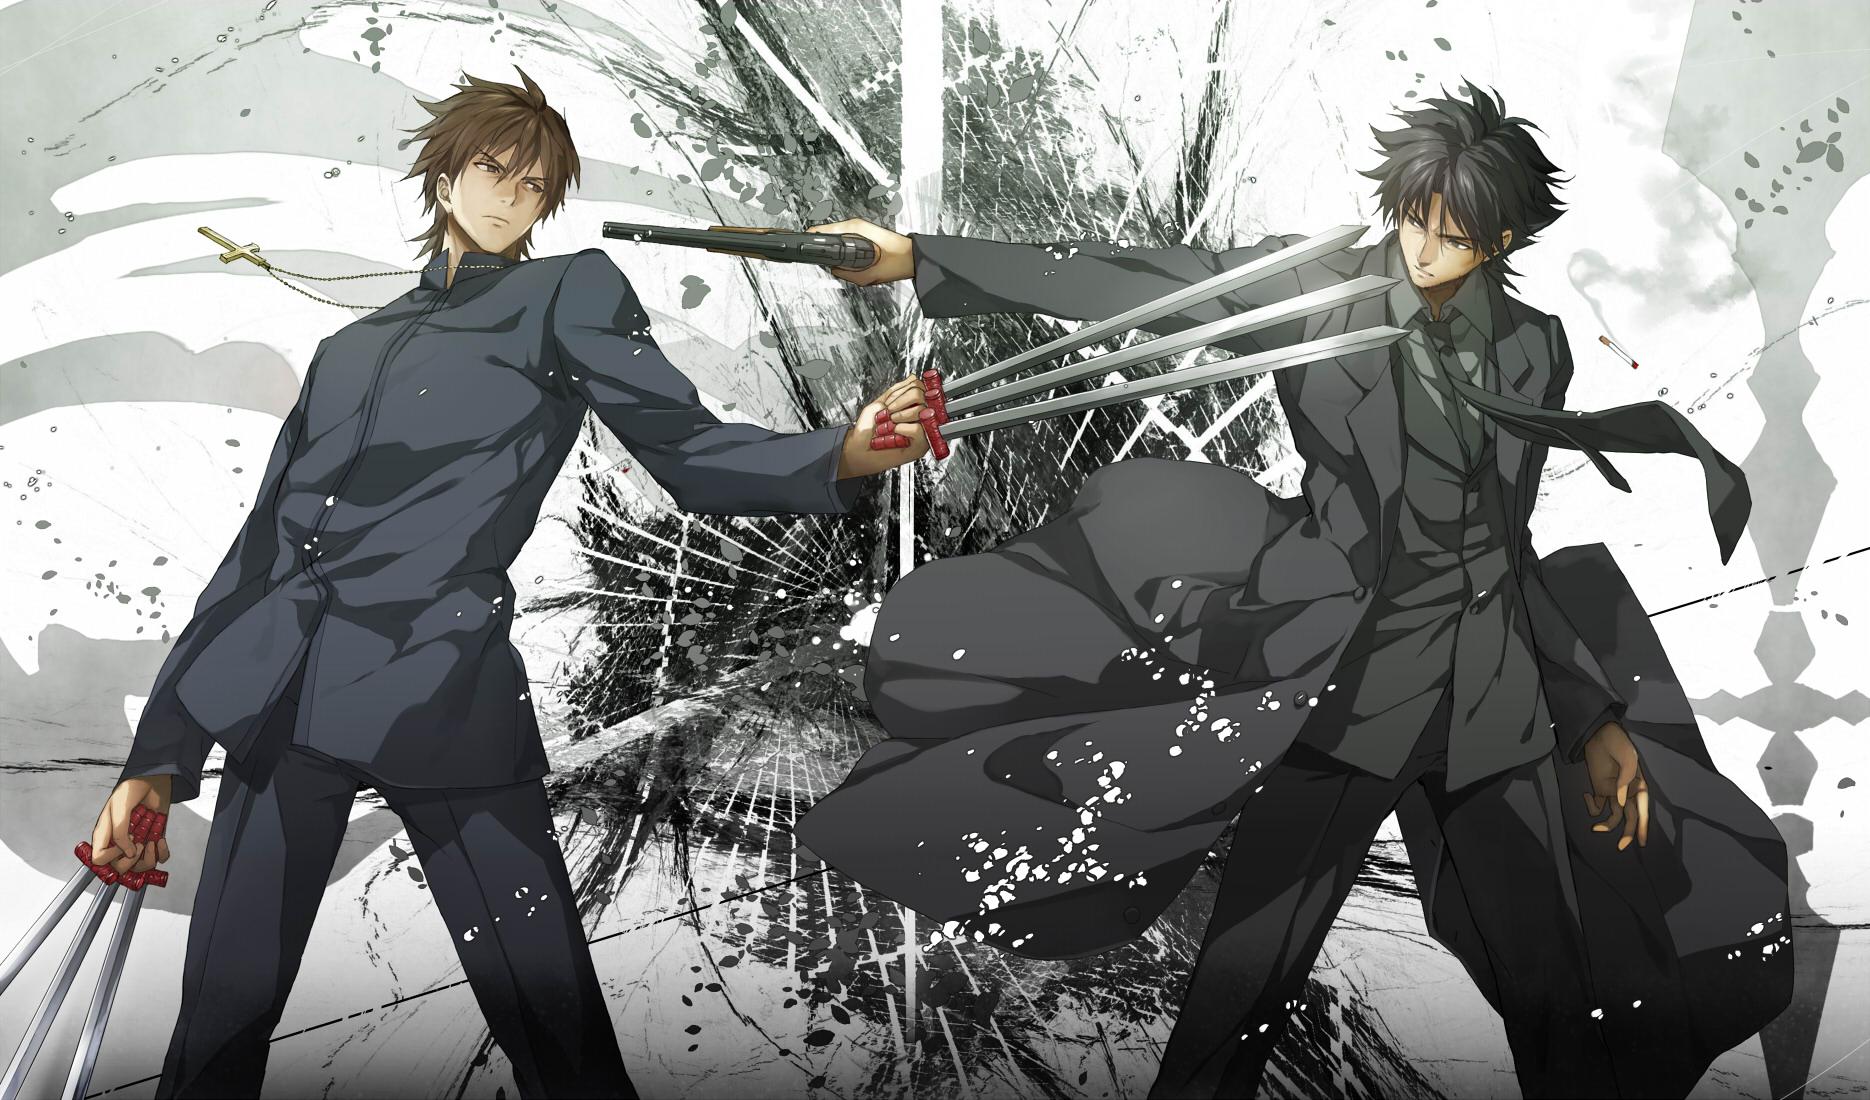 Anime Fight Characters 0 1 : Wallpaper of the week emiya kiritsugu kotomine kirei